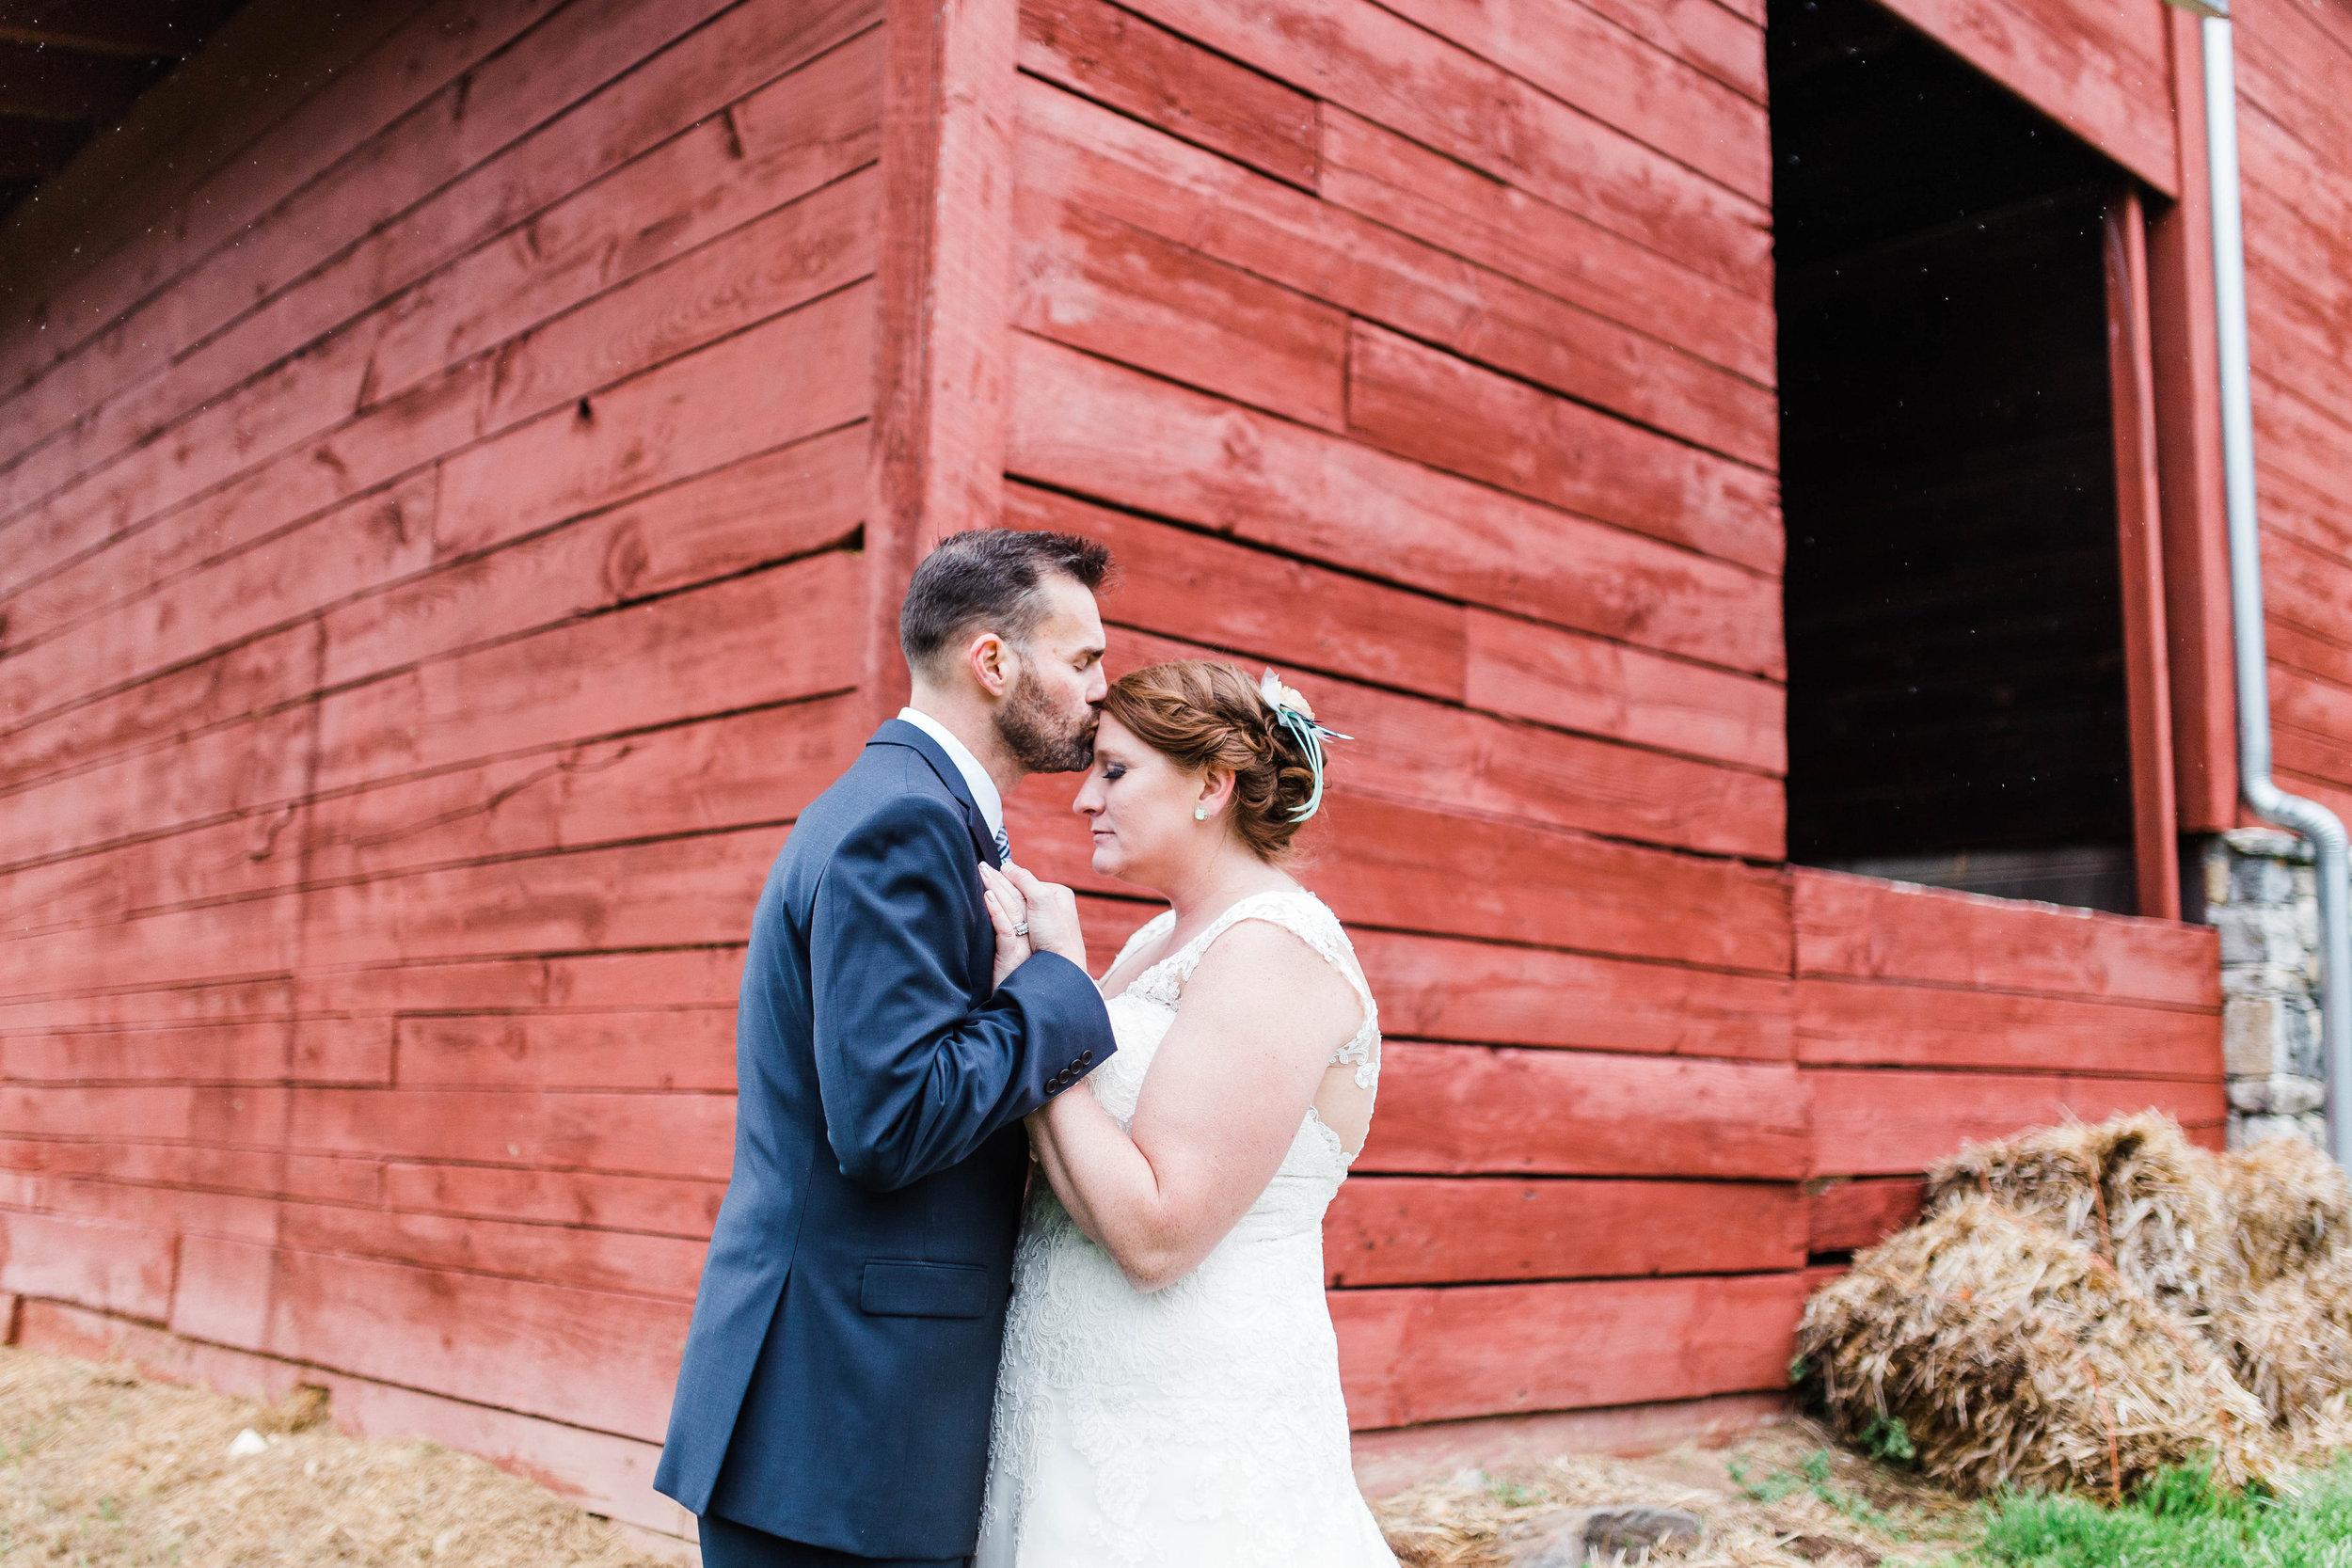 Honeysuckle-Hill-Weddings-Andrew-Rachel-127.jpg